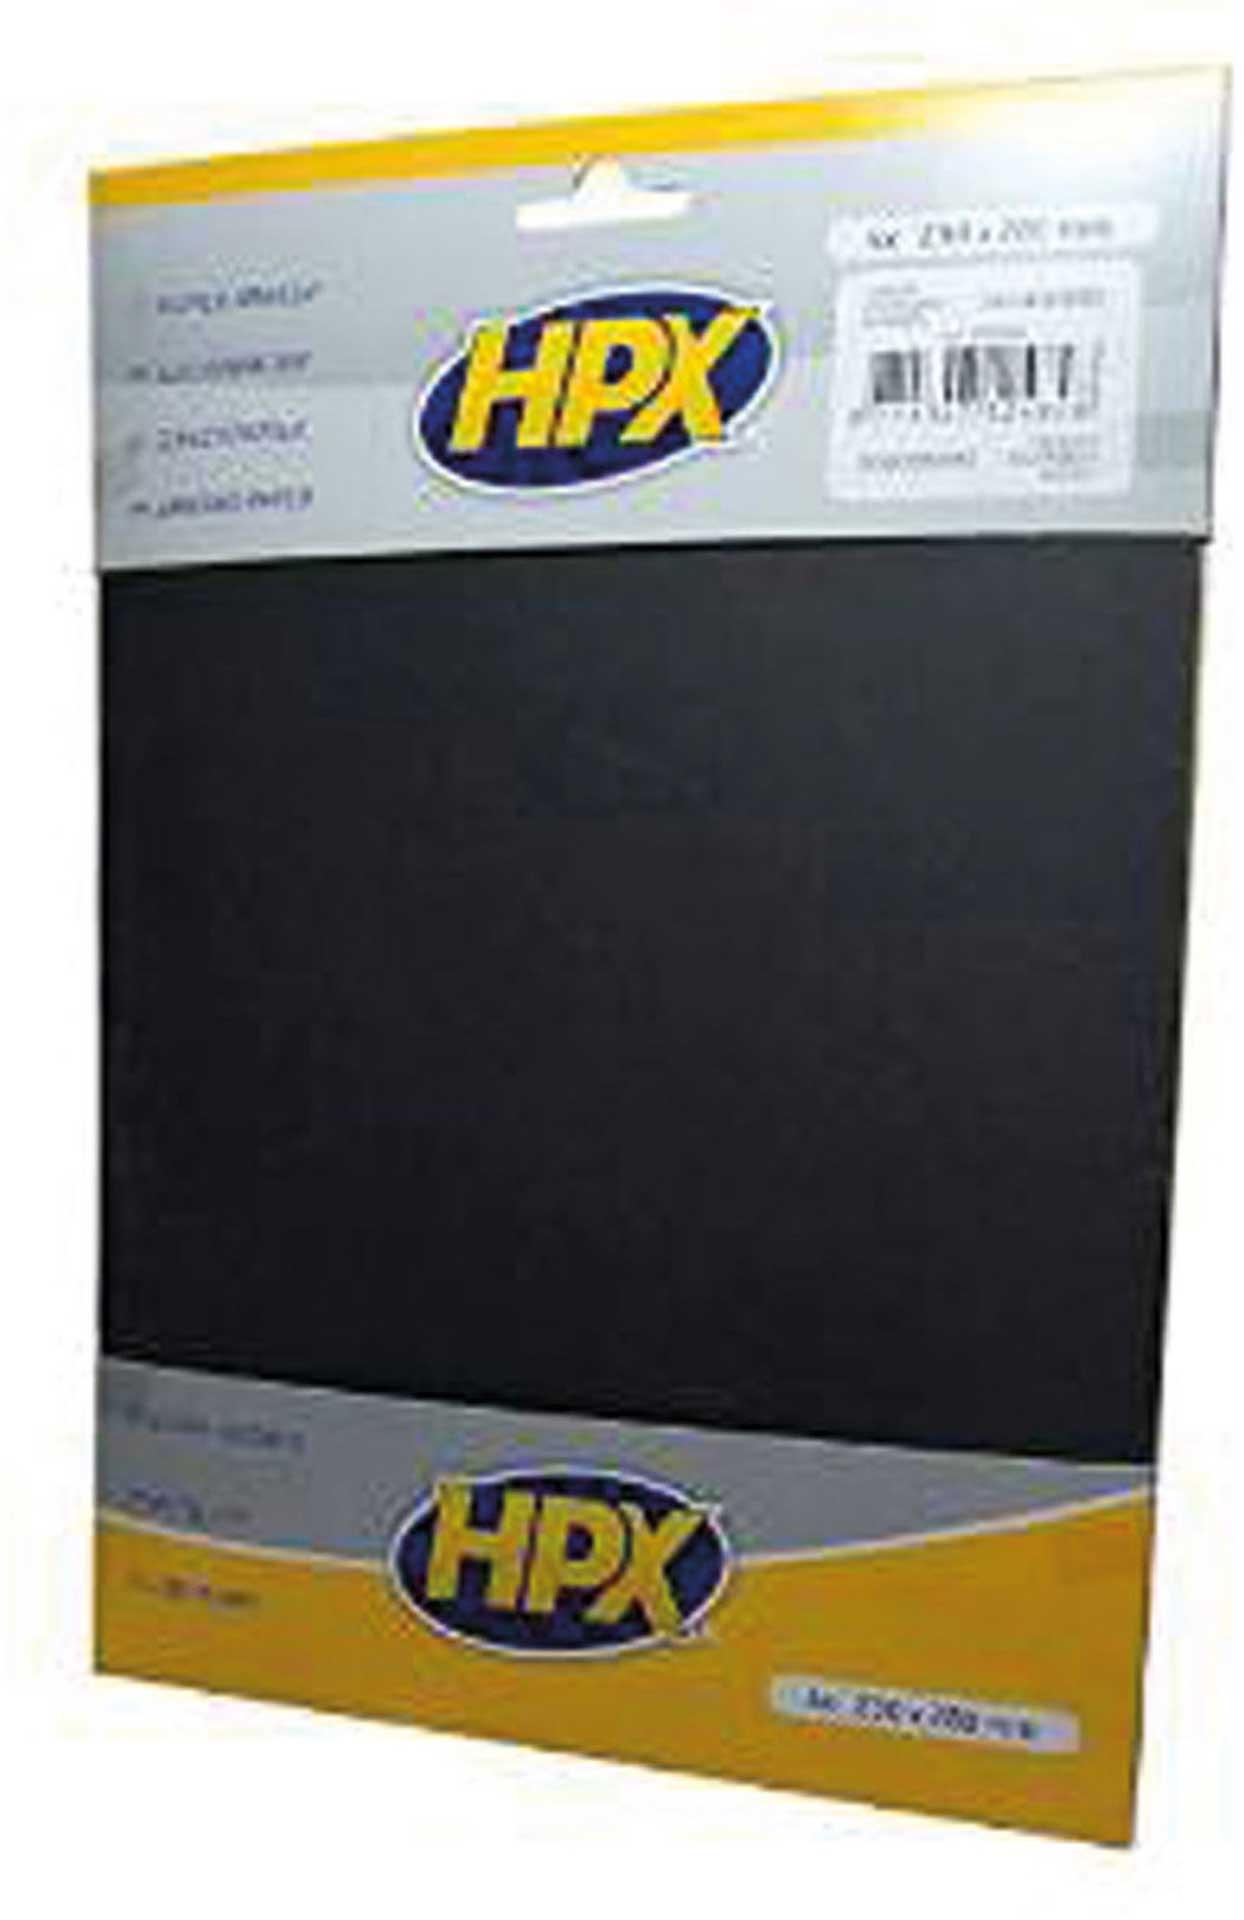 MODELLBAU LINDINGER HPX WET SANDPAPER SET P240/400/600 4PCS.